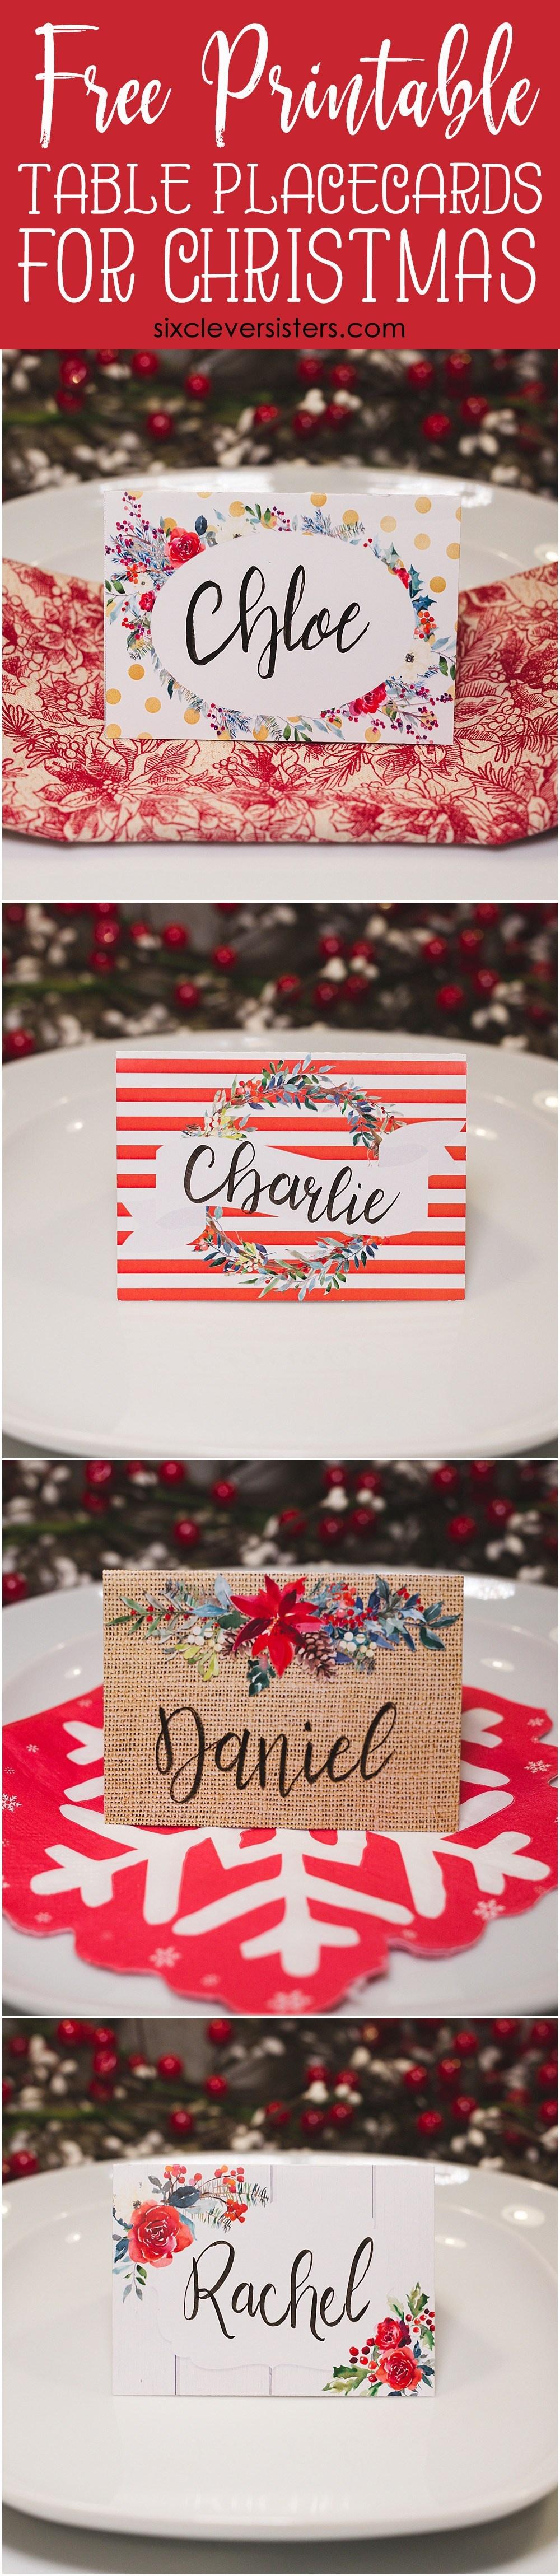 Christmas Table Place Cards { Free Printable} - Six Clever Sisters - Free Printable Christmas Place Name Tags